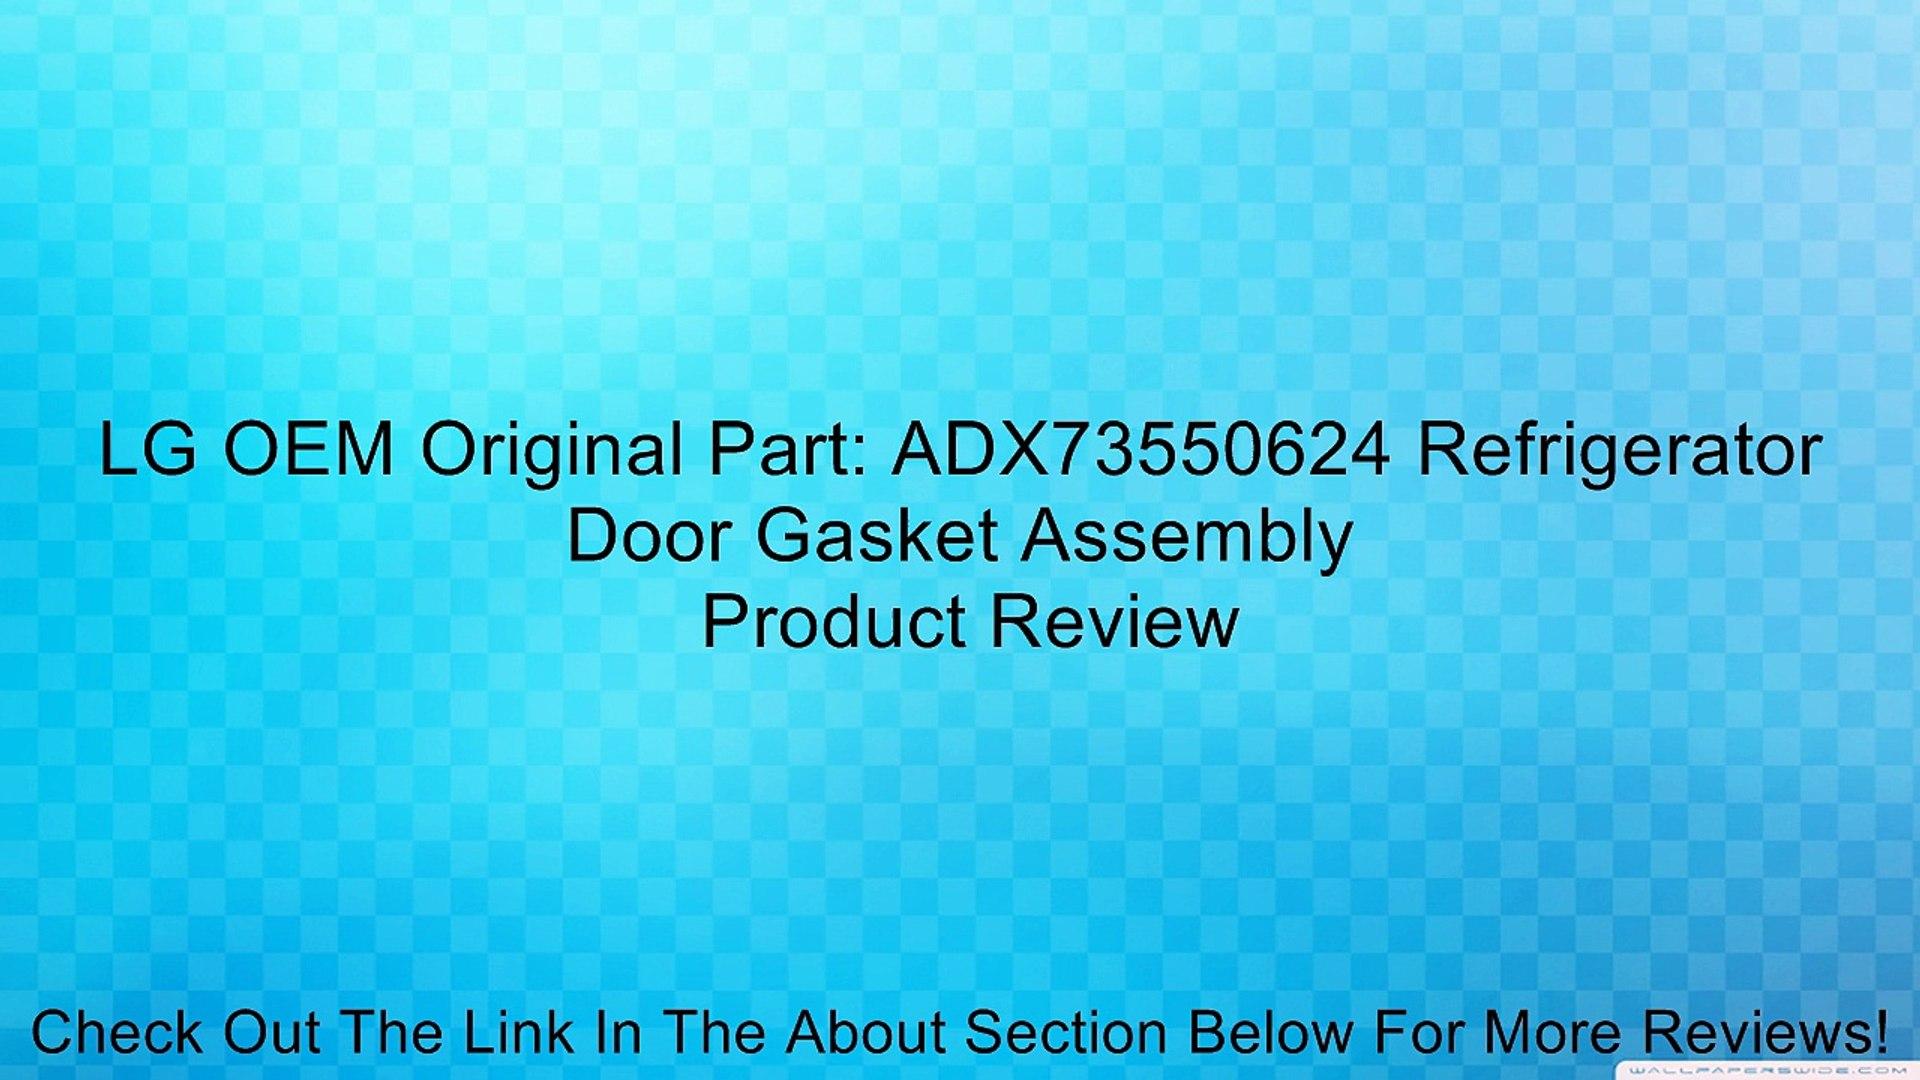 Genuine ADX73550624 LG Appliance Gasket Assembly Door